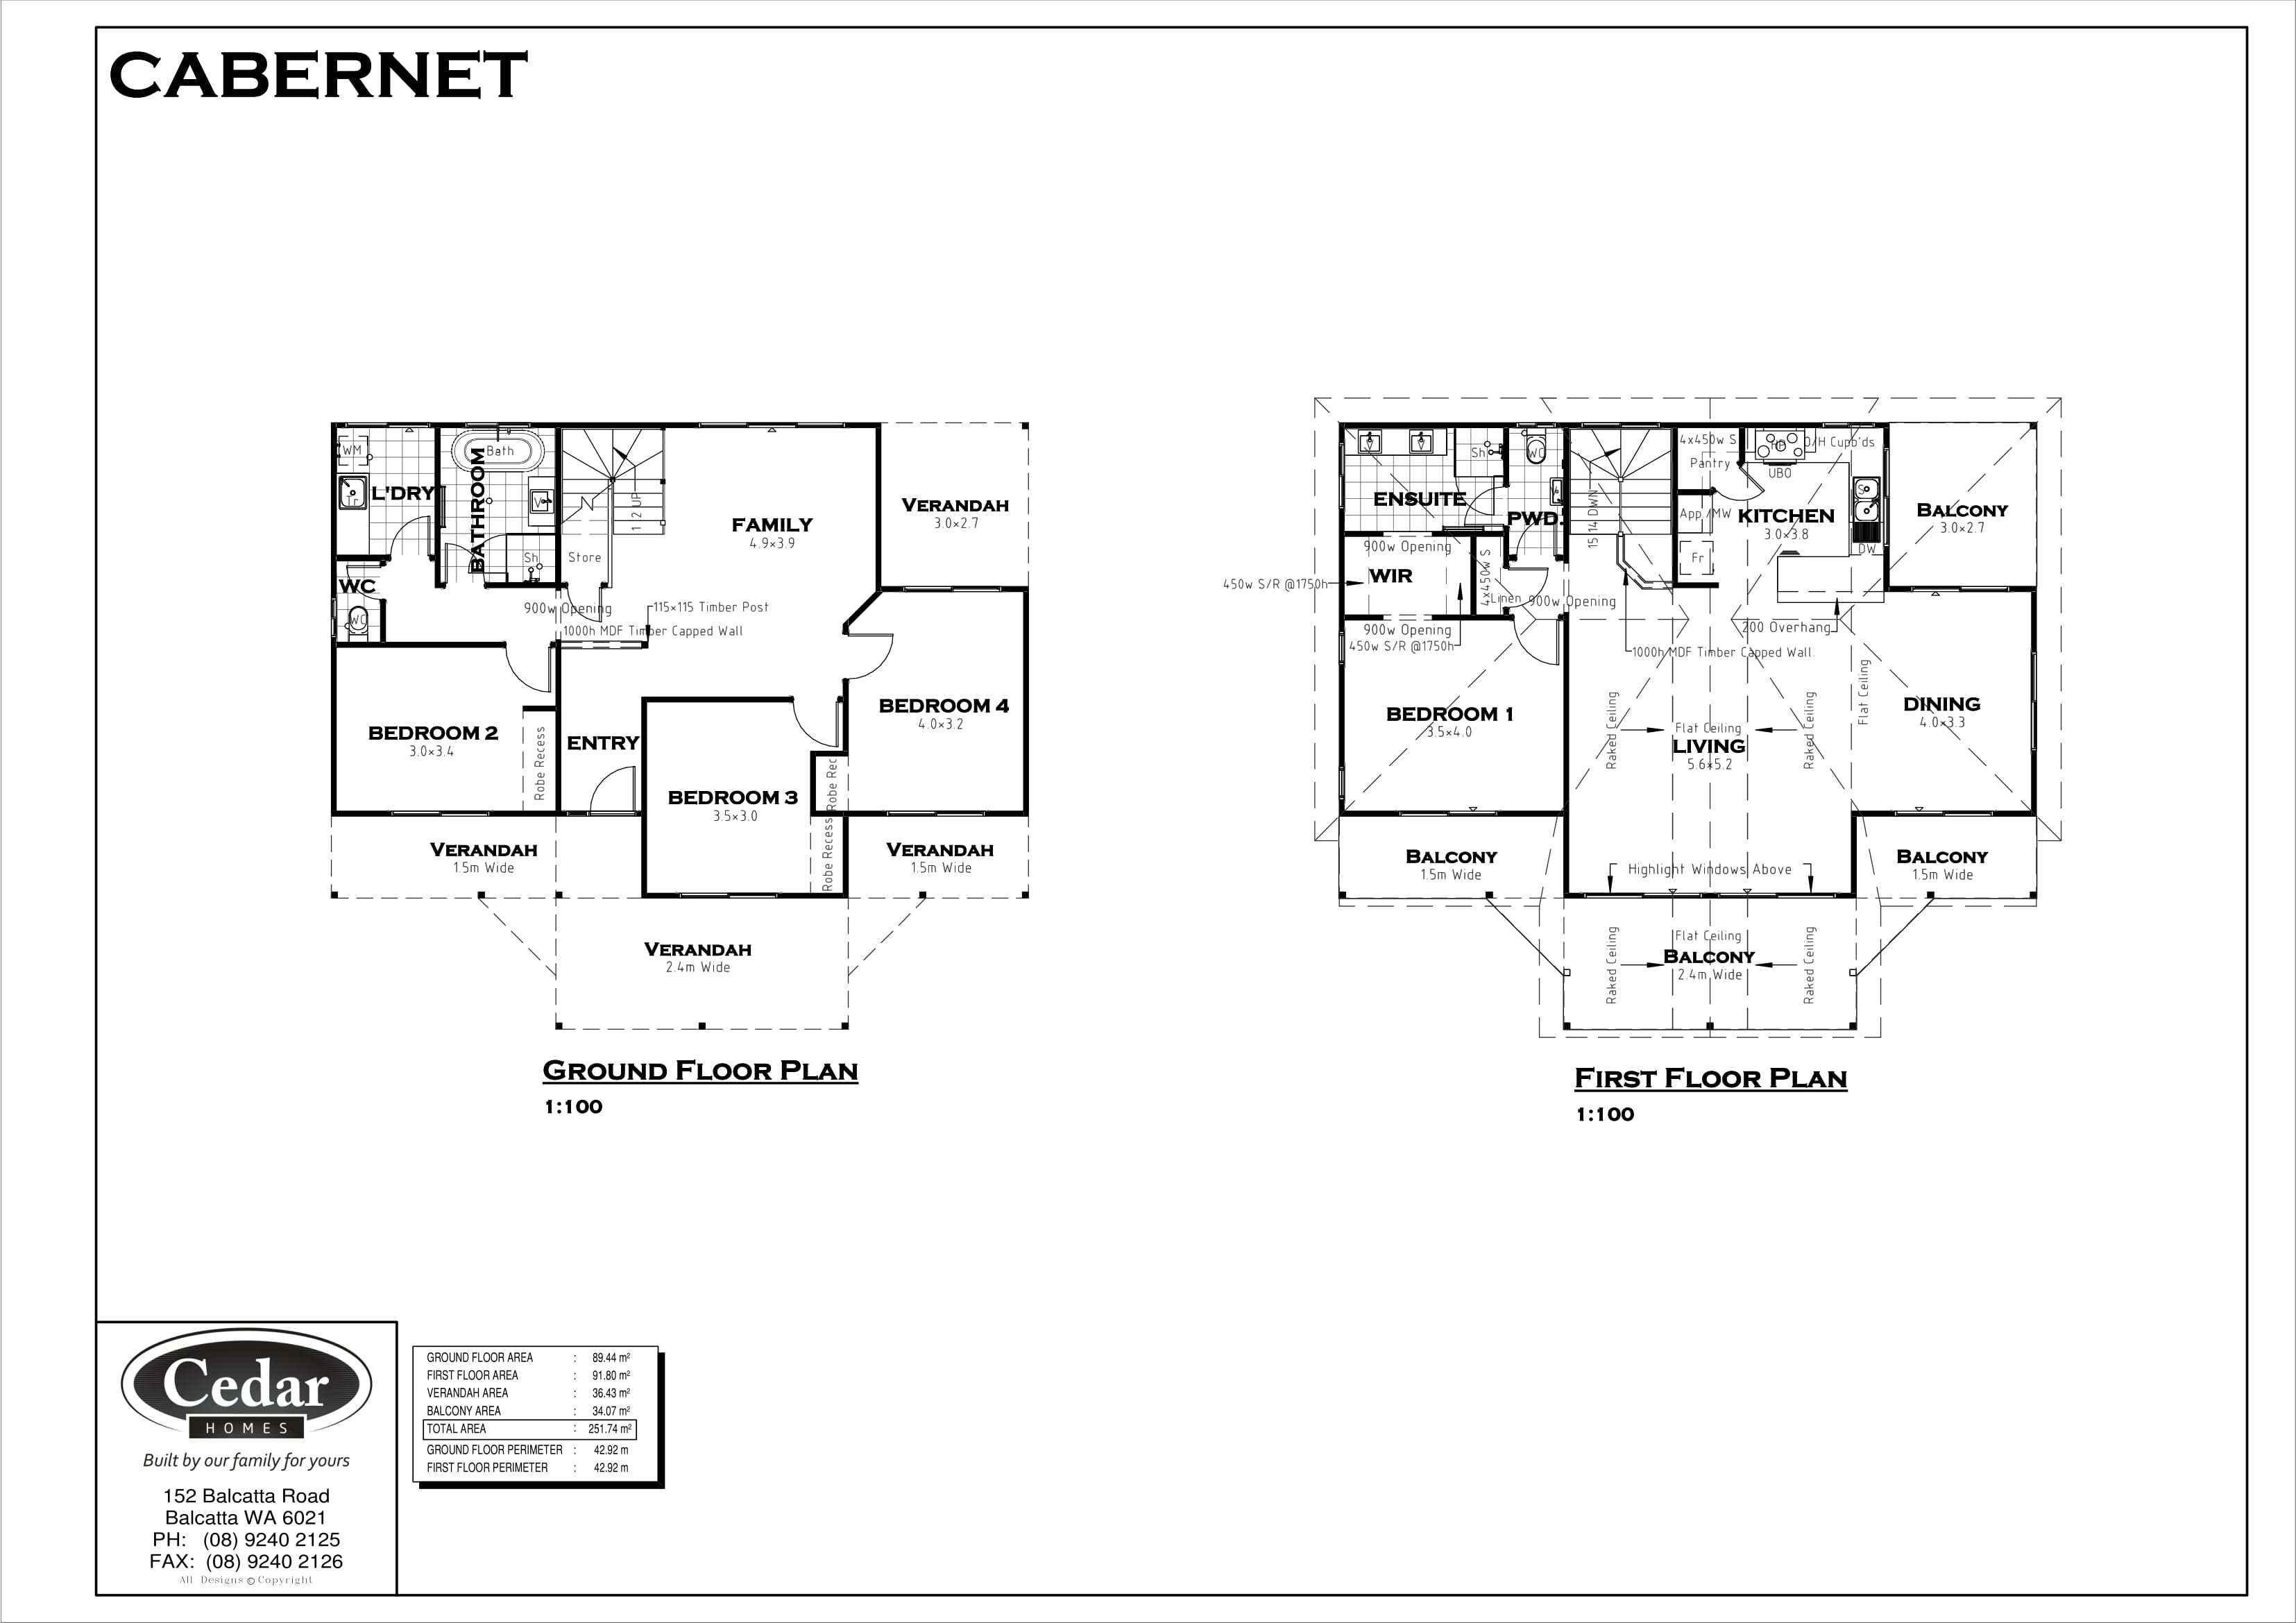 Cedar Homes Cabernet Floor Plan